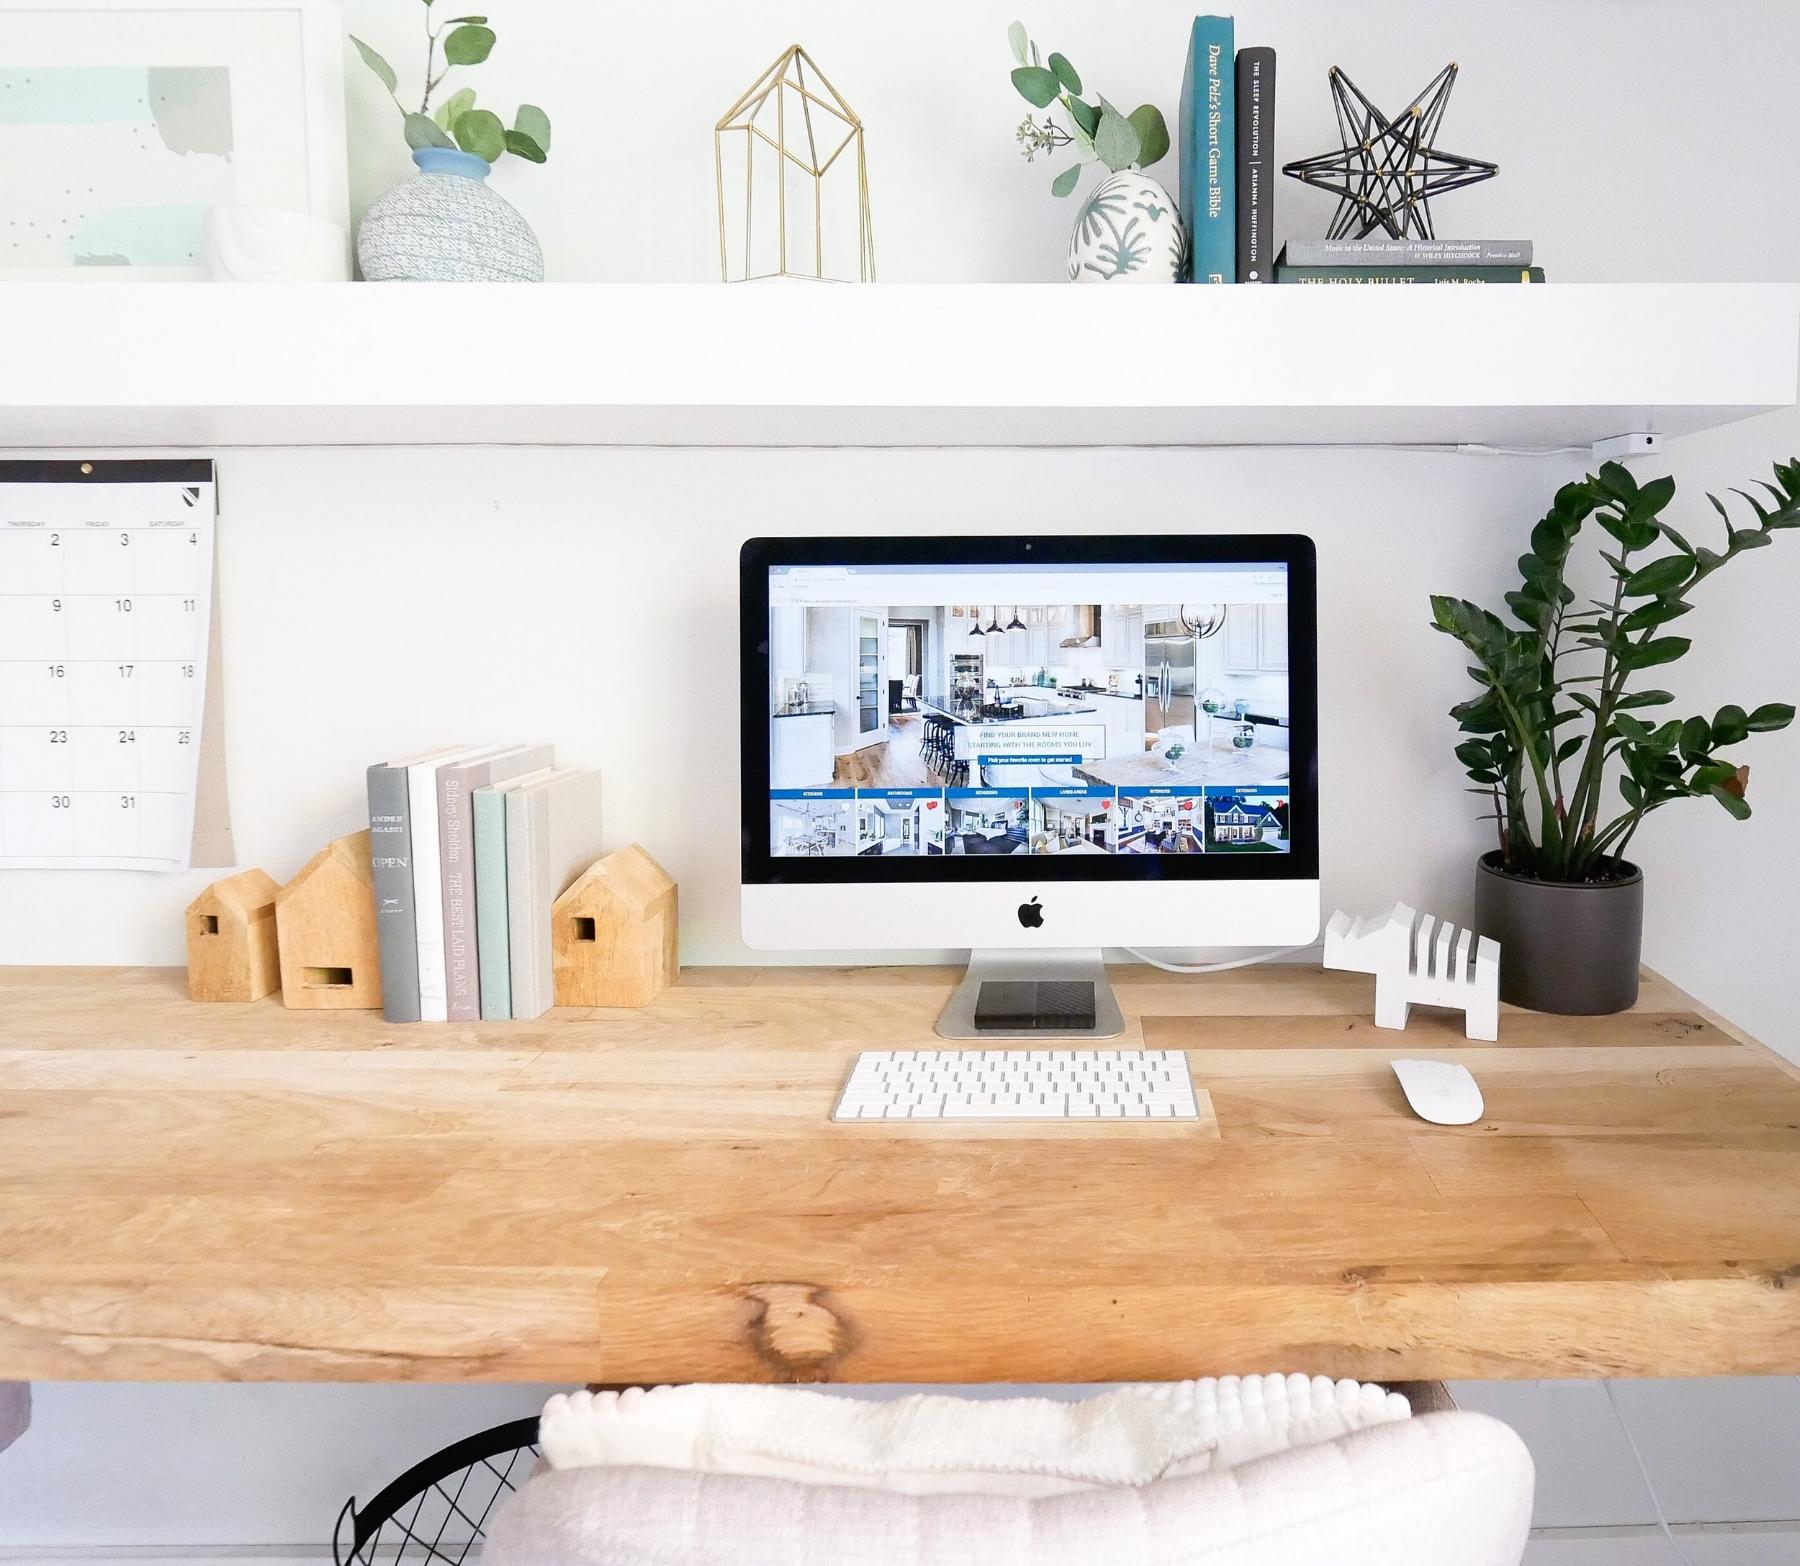 Homluvcom Building Your Home Made Easier Mint Pine